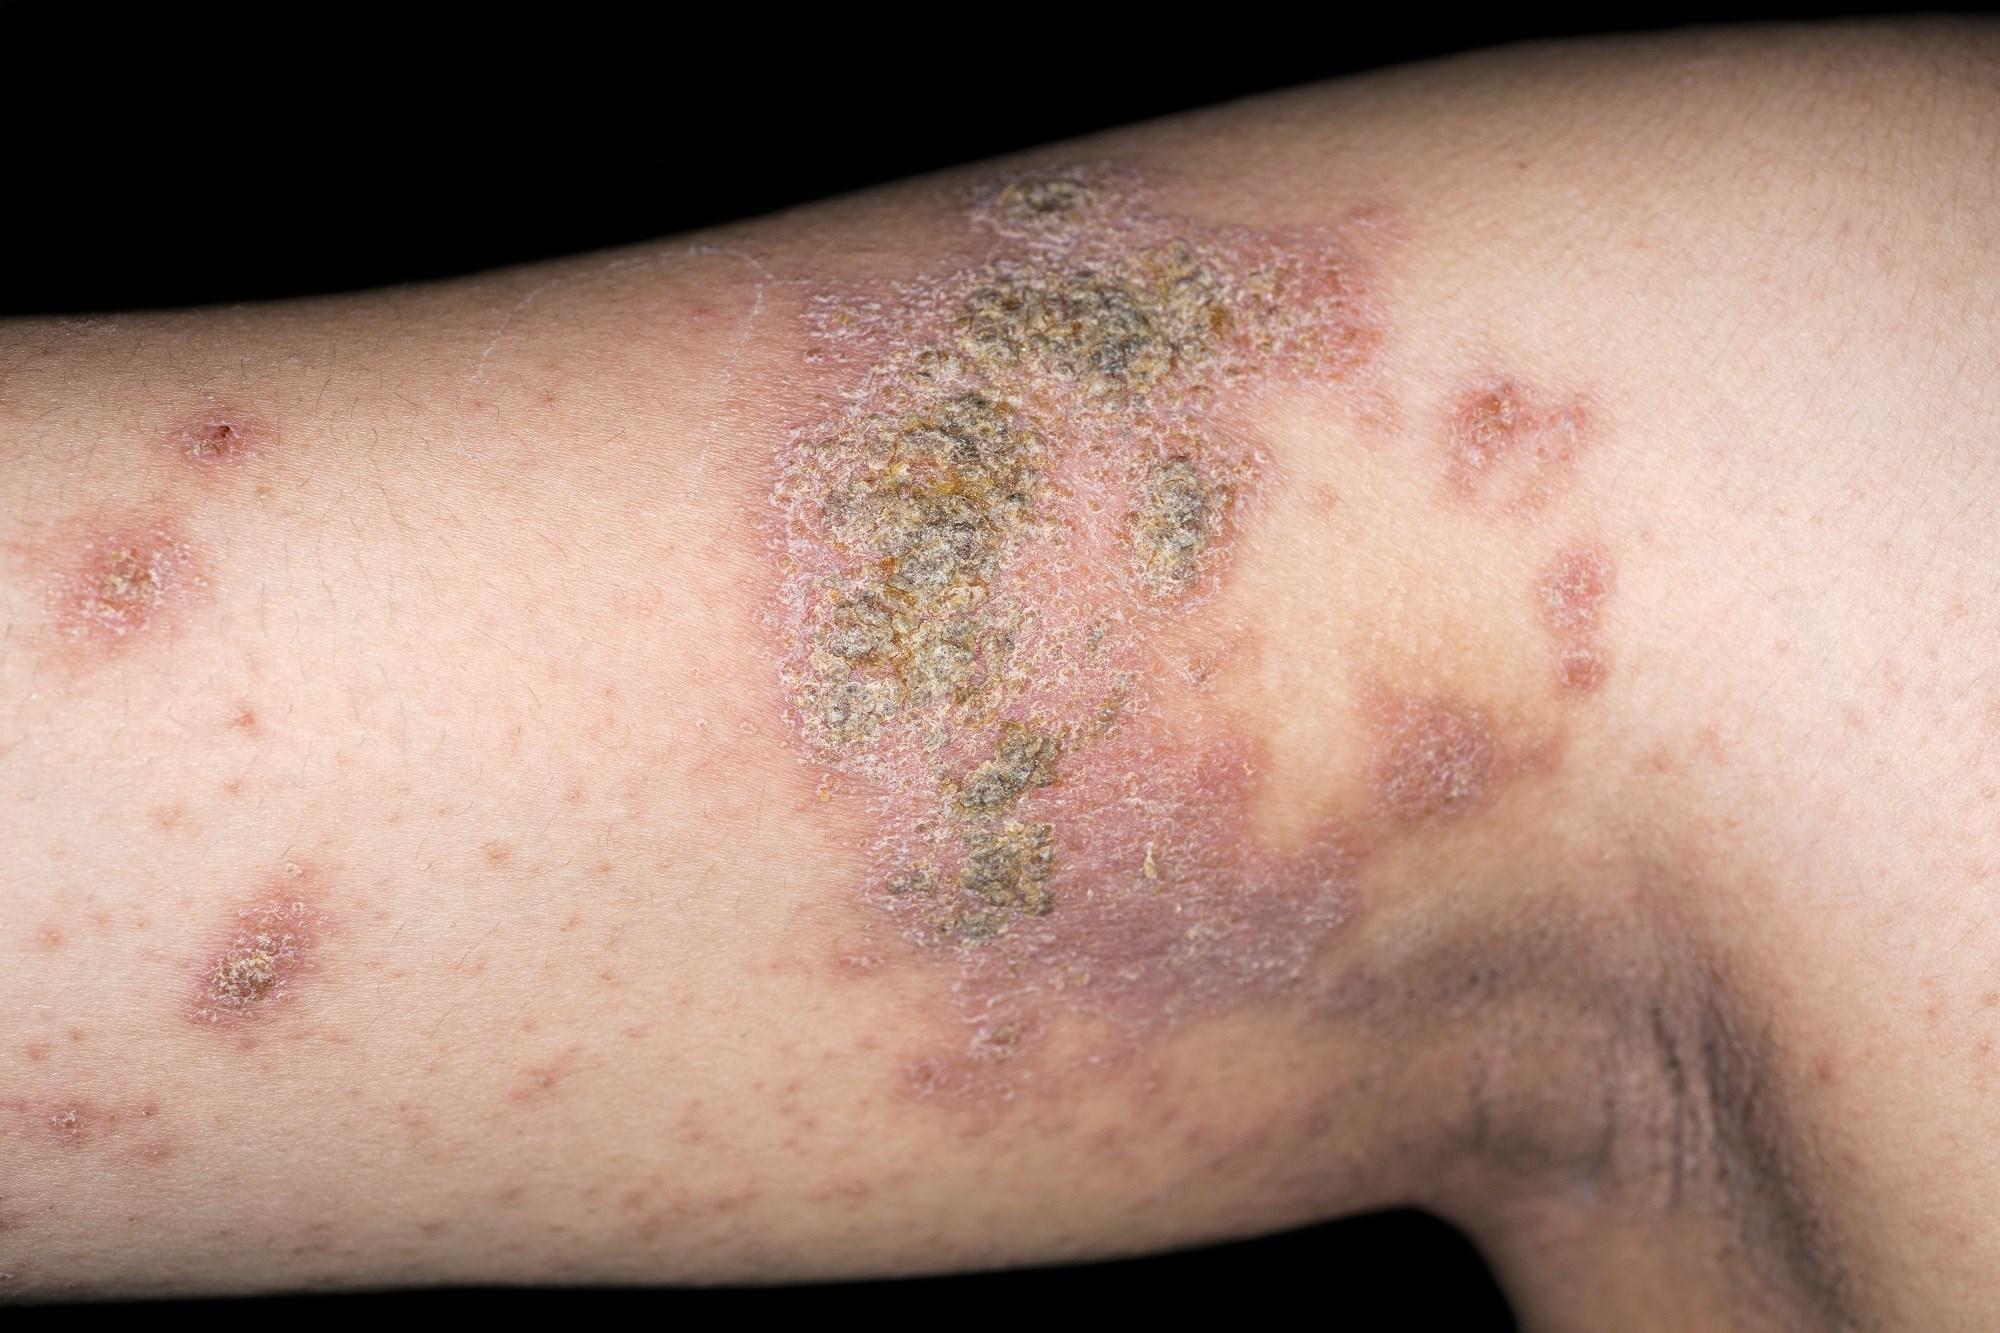 Tapinarof Cream Safe, Effective for Atopic Dermatitis